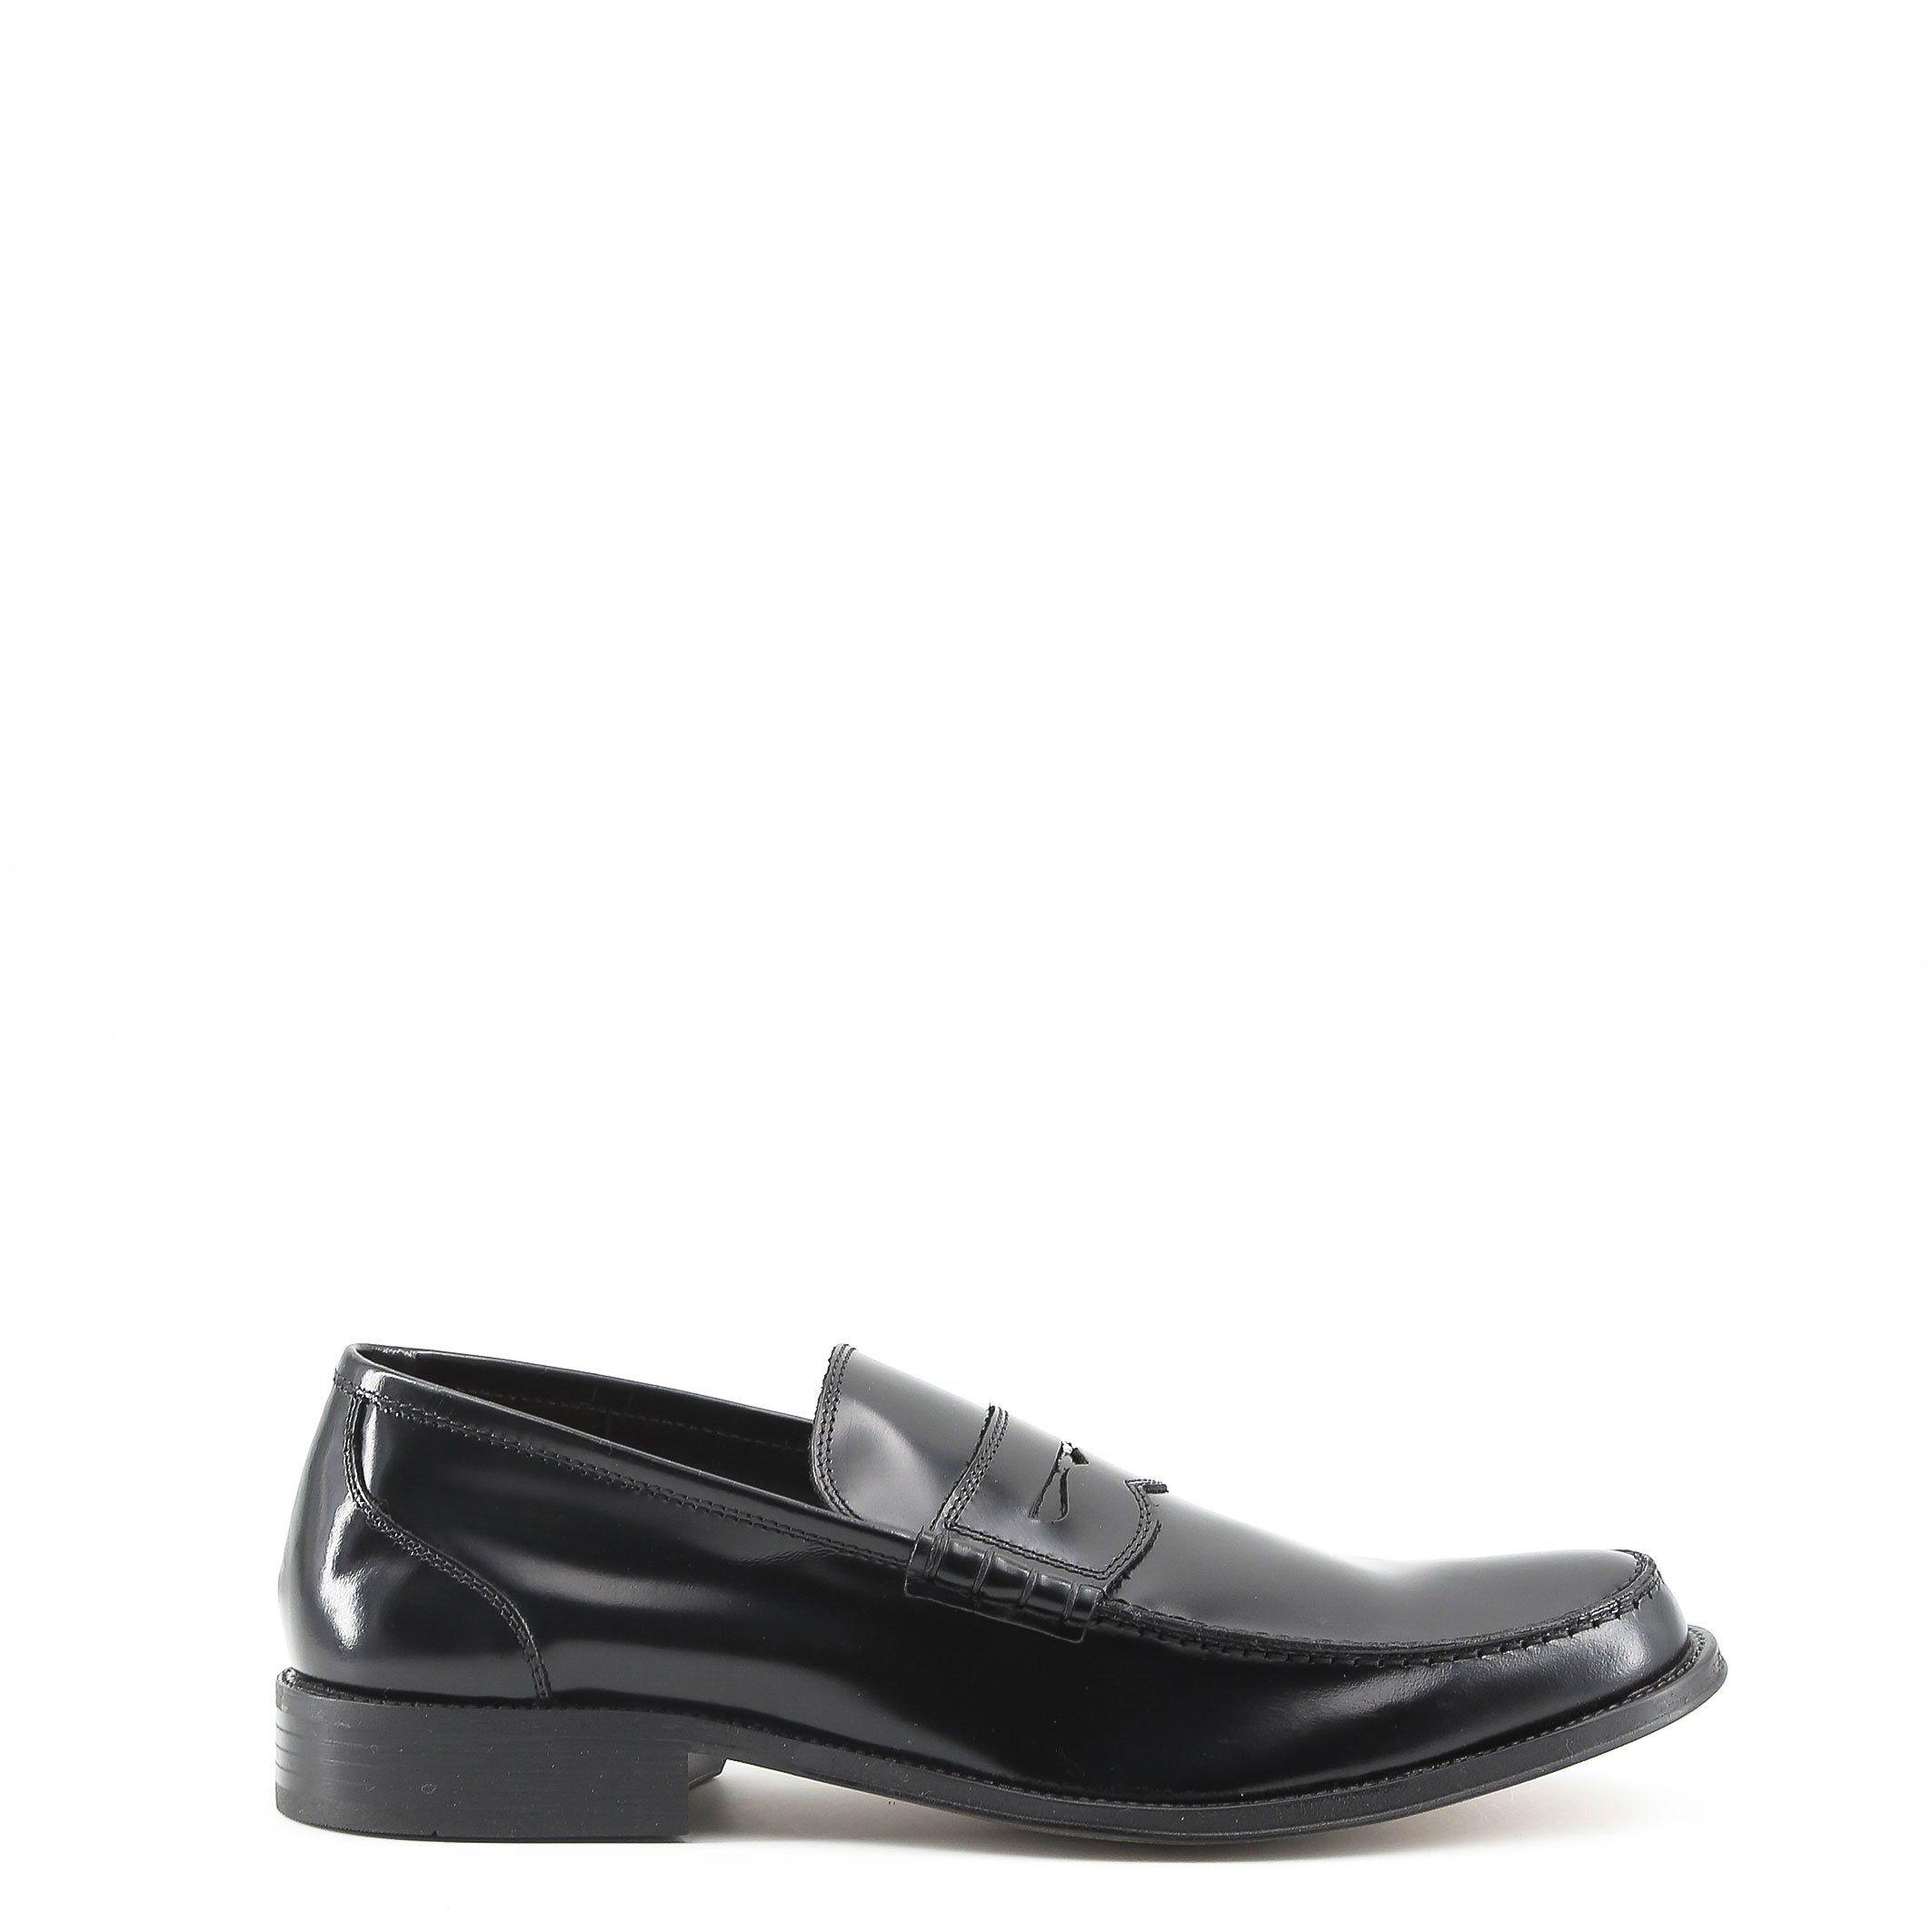 LEONARDO SHOES Luxury Fashion Mens Loafers Summer